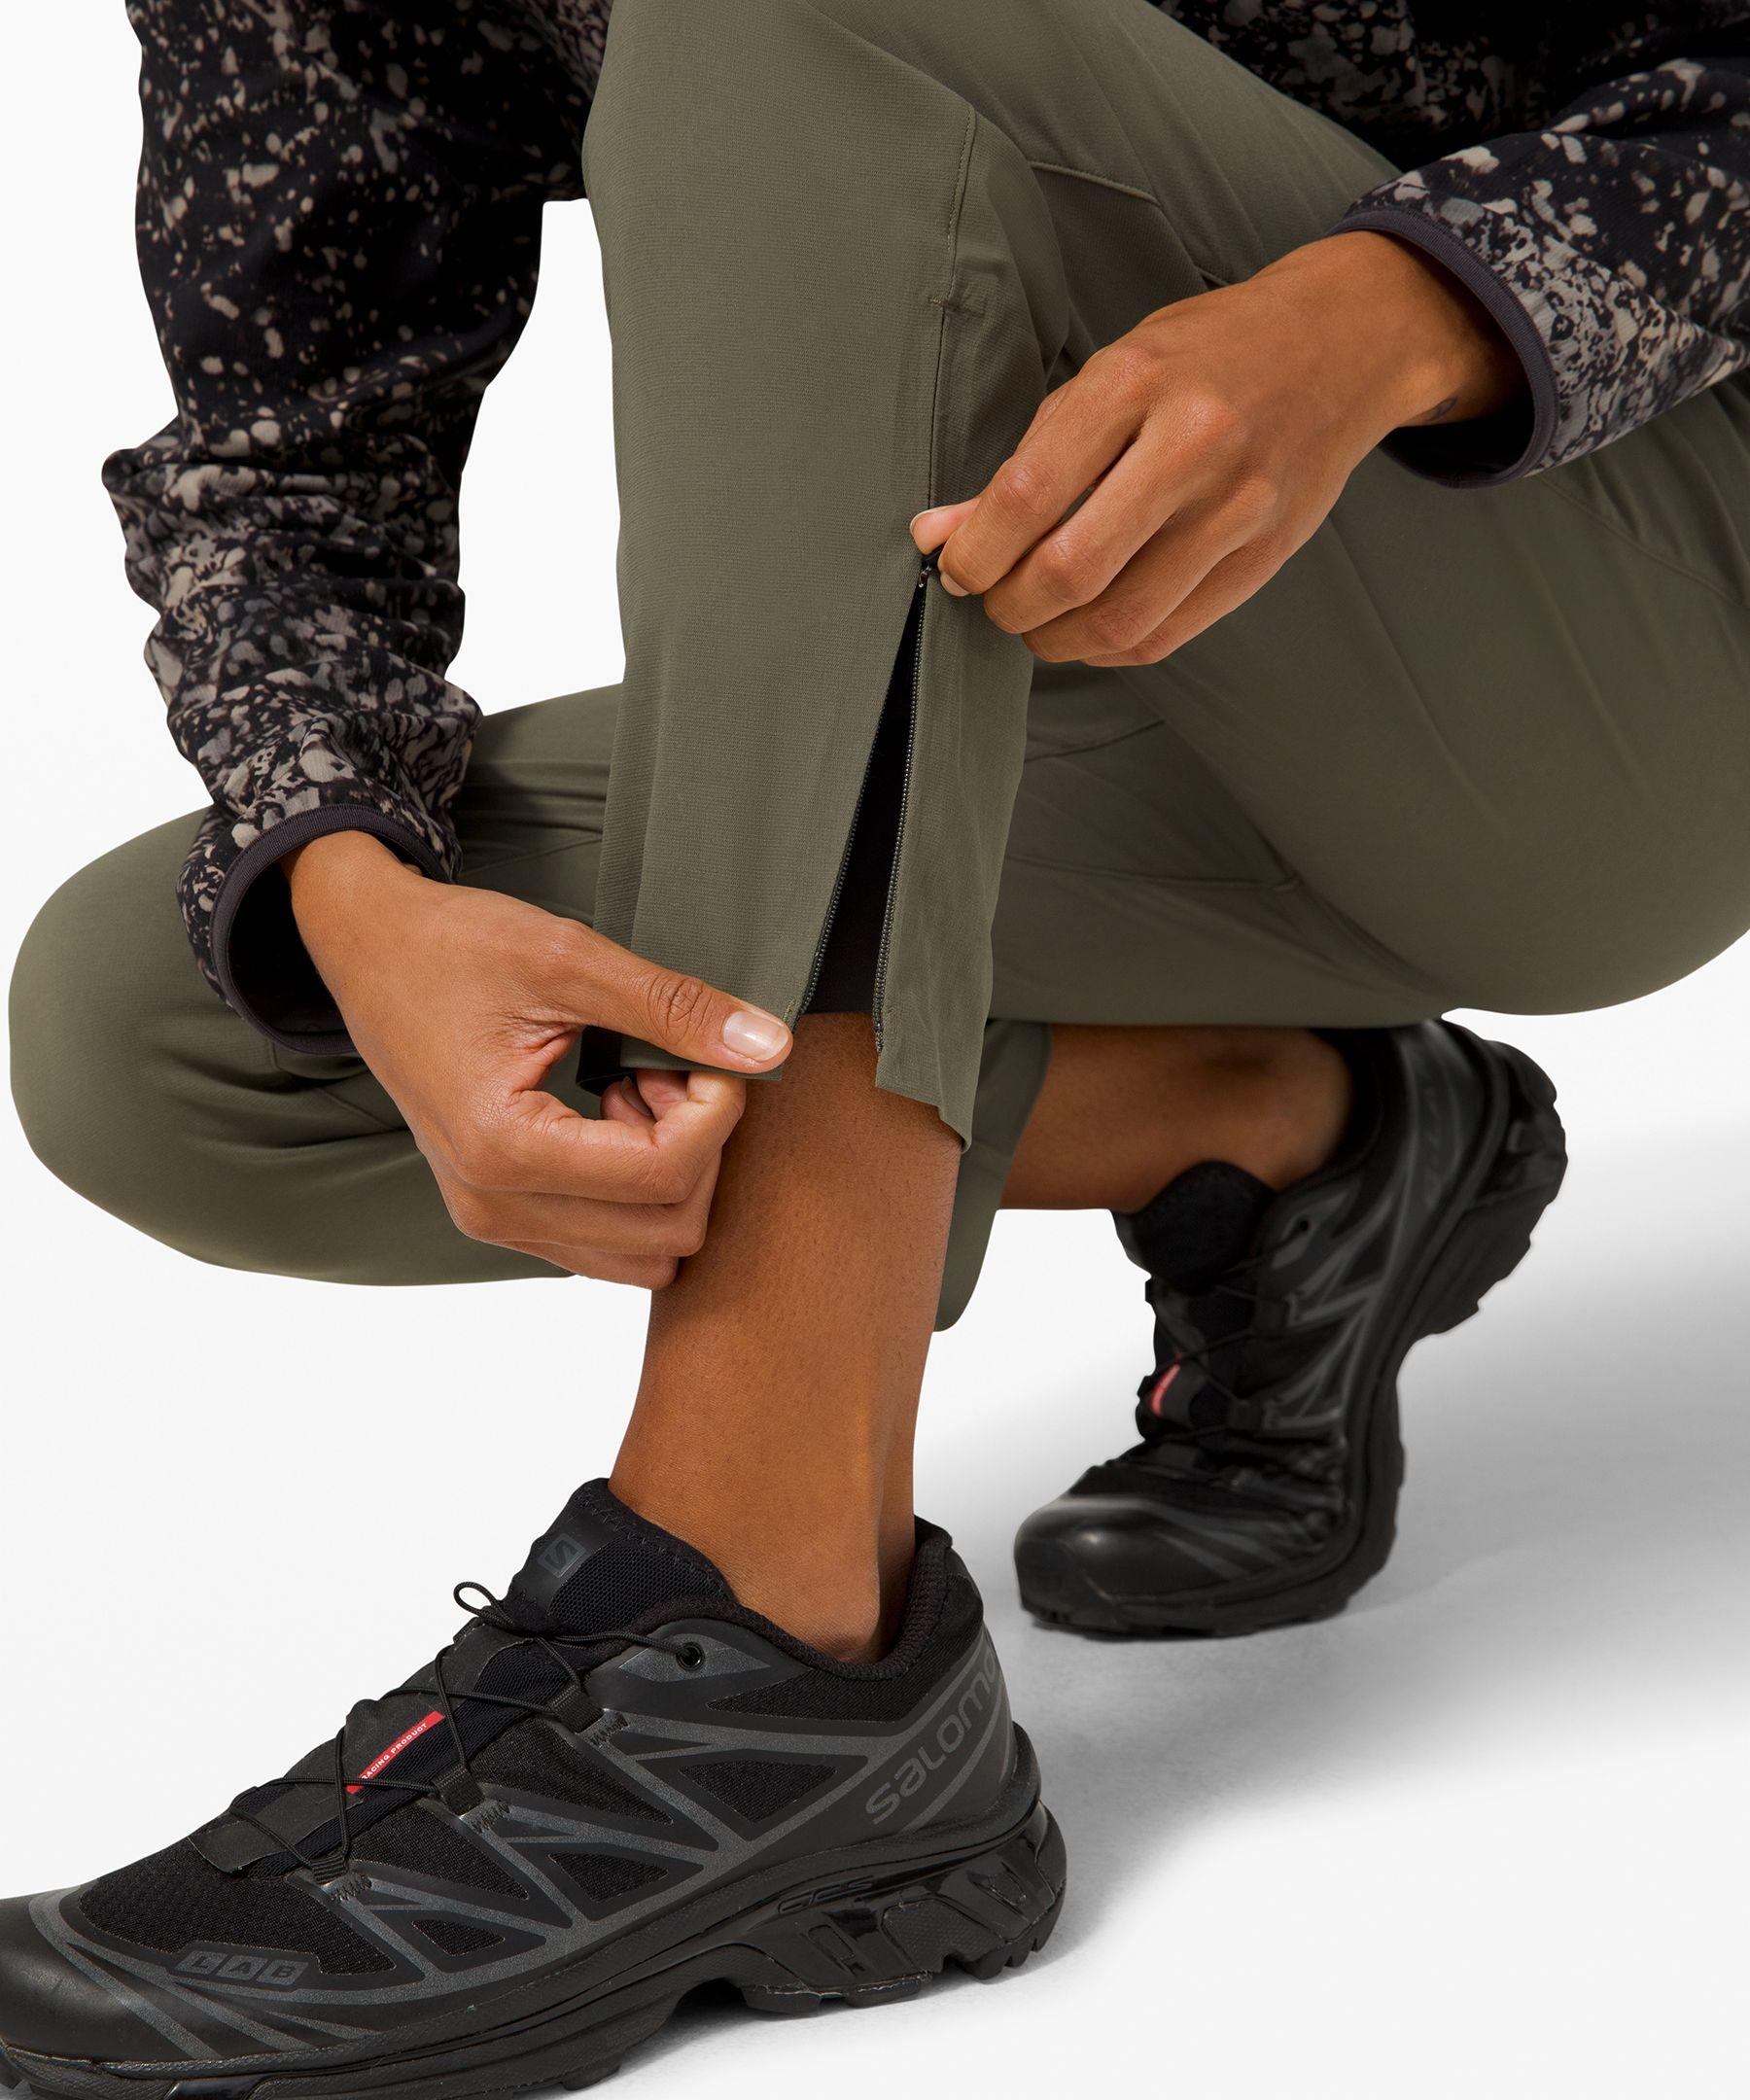 Tolva Cropped Pant *lululemon lab